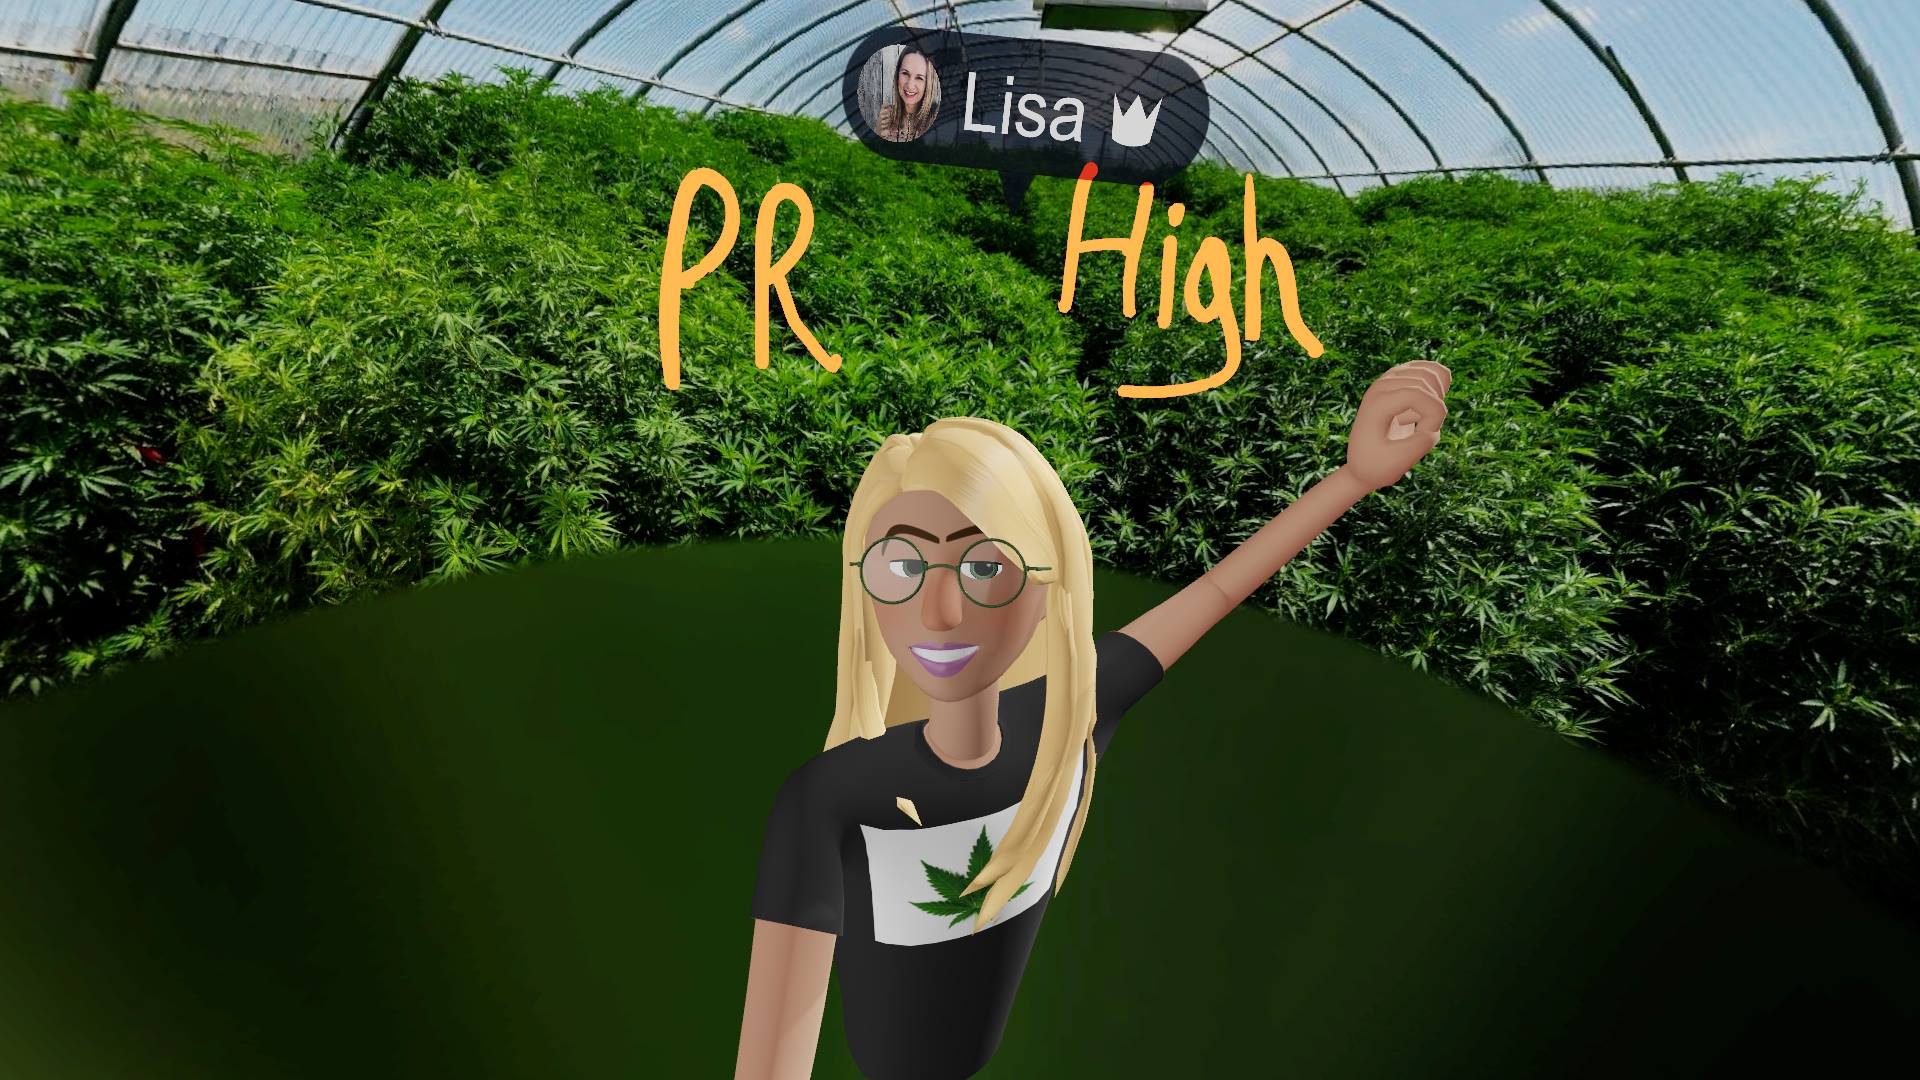 PR High Fives for Cannabis Business